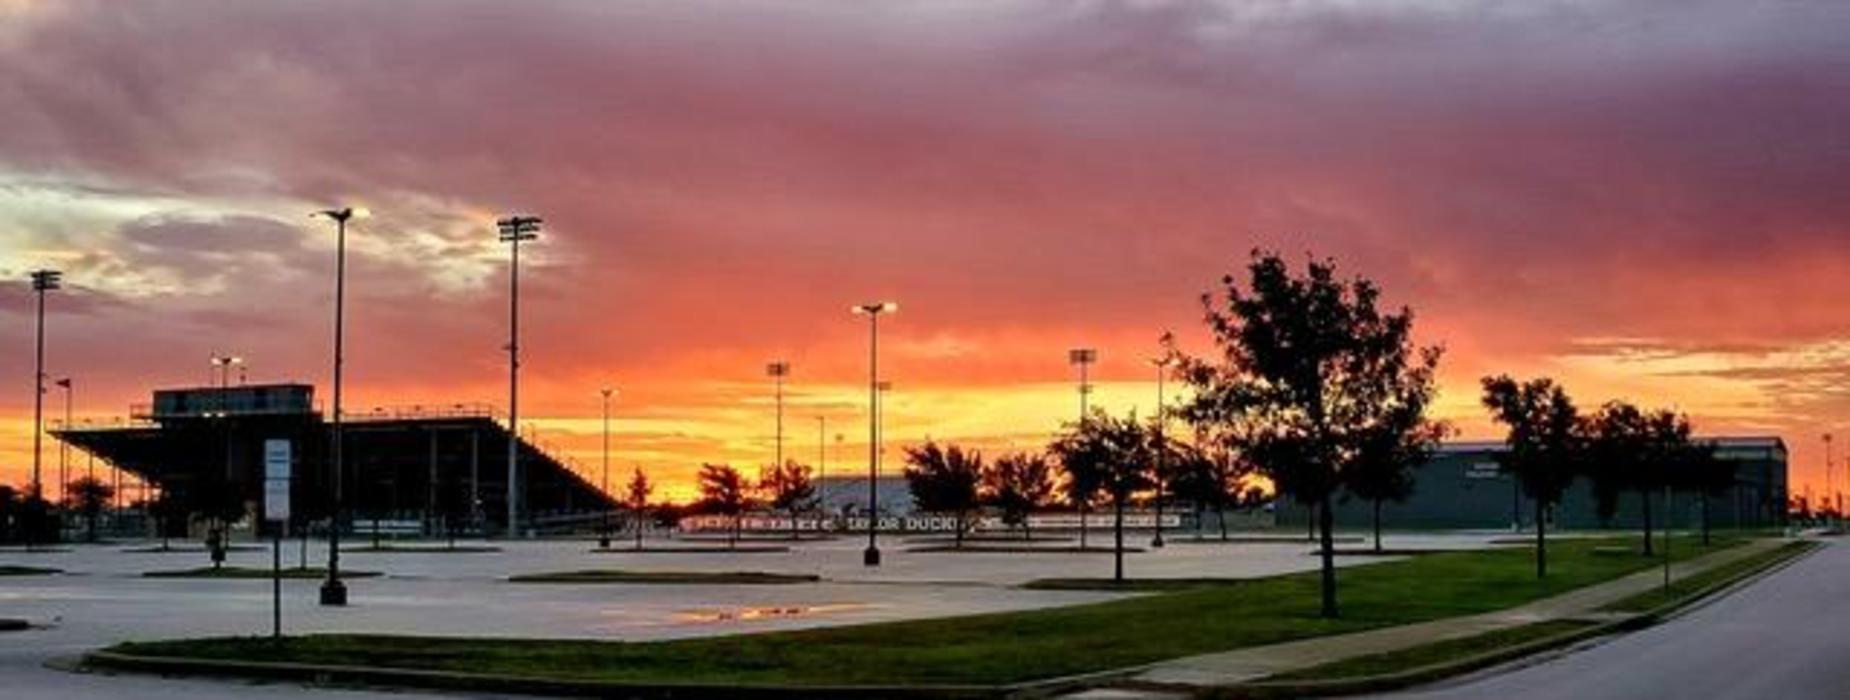 THS Sunset 2